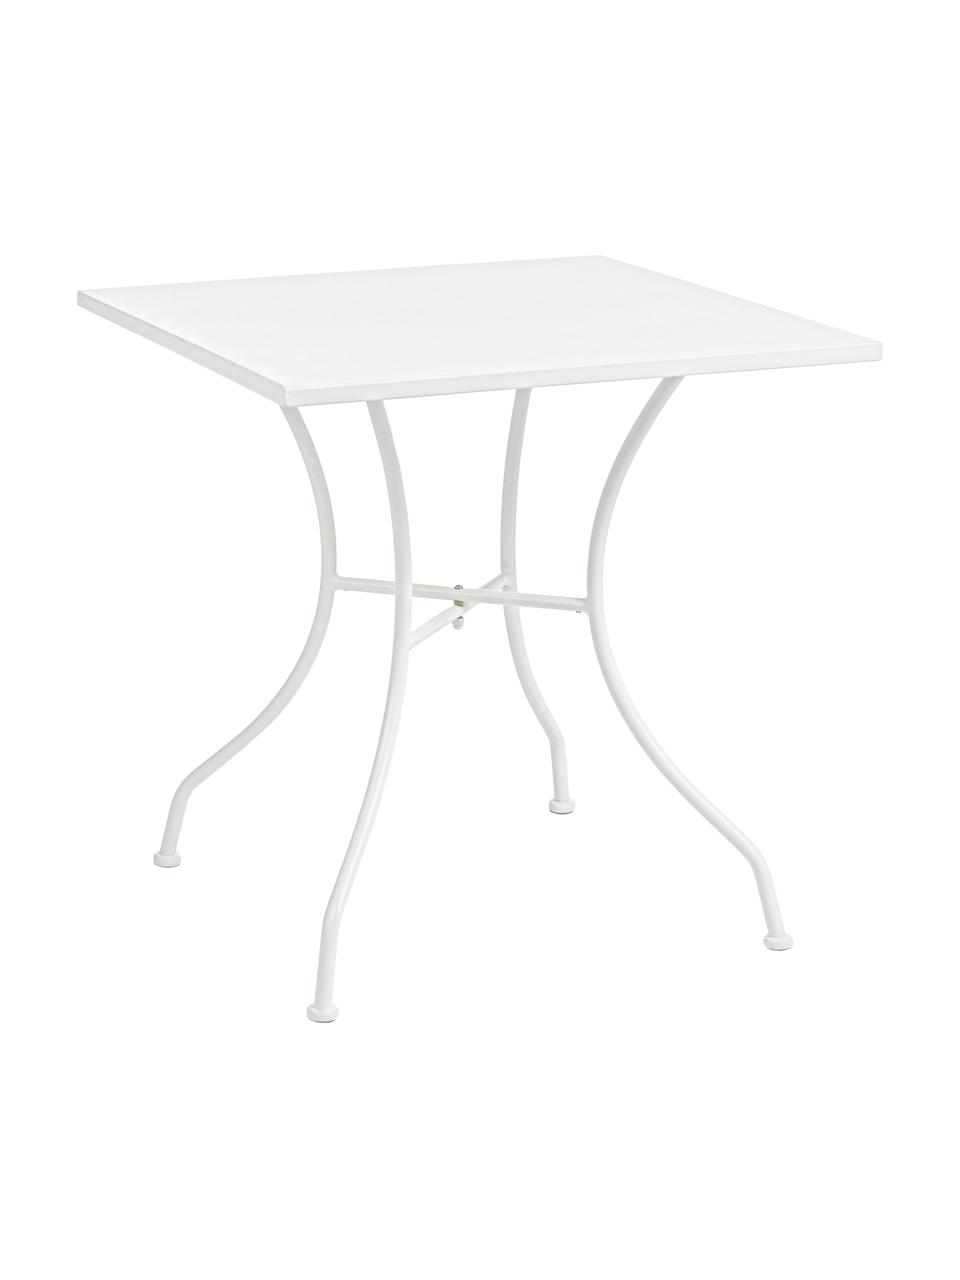 Tavolino da giardino in metallo Kelsie, Acciaio verniciato, Bianco, Larg. 70 x Alt. 70 cm